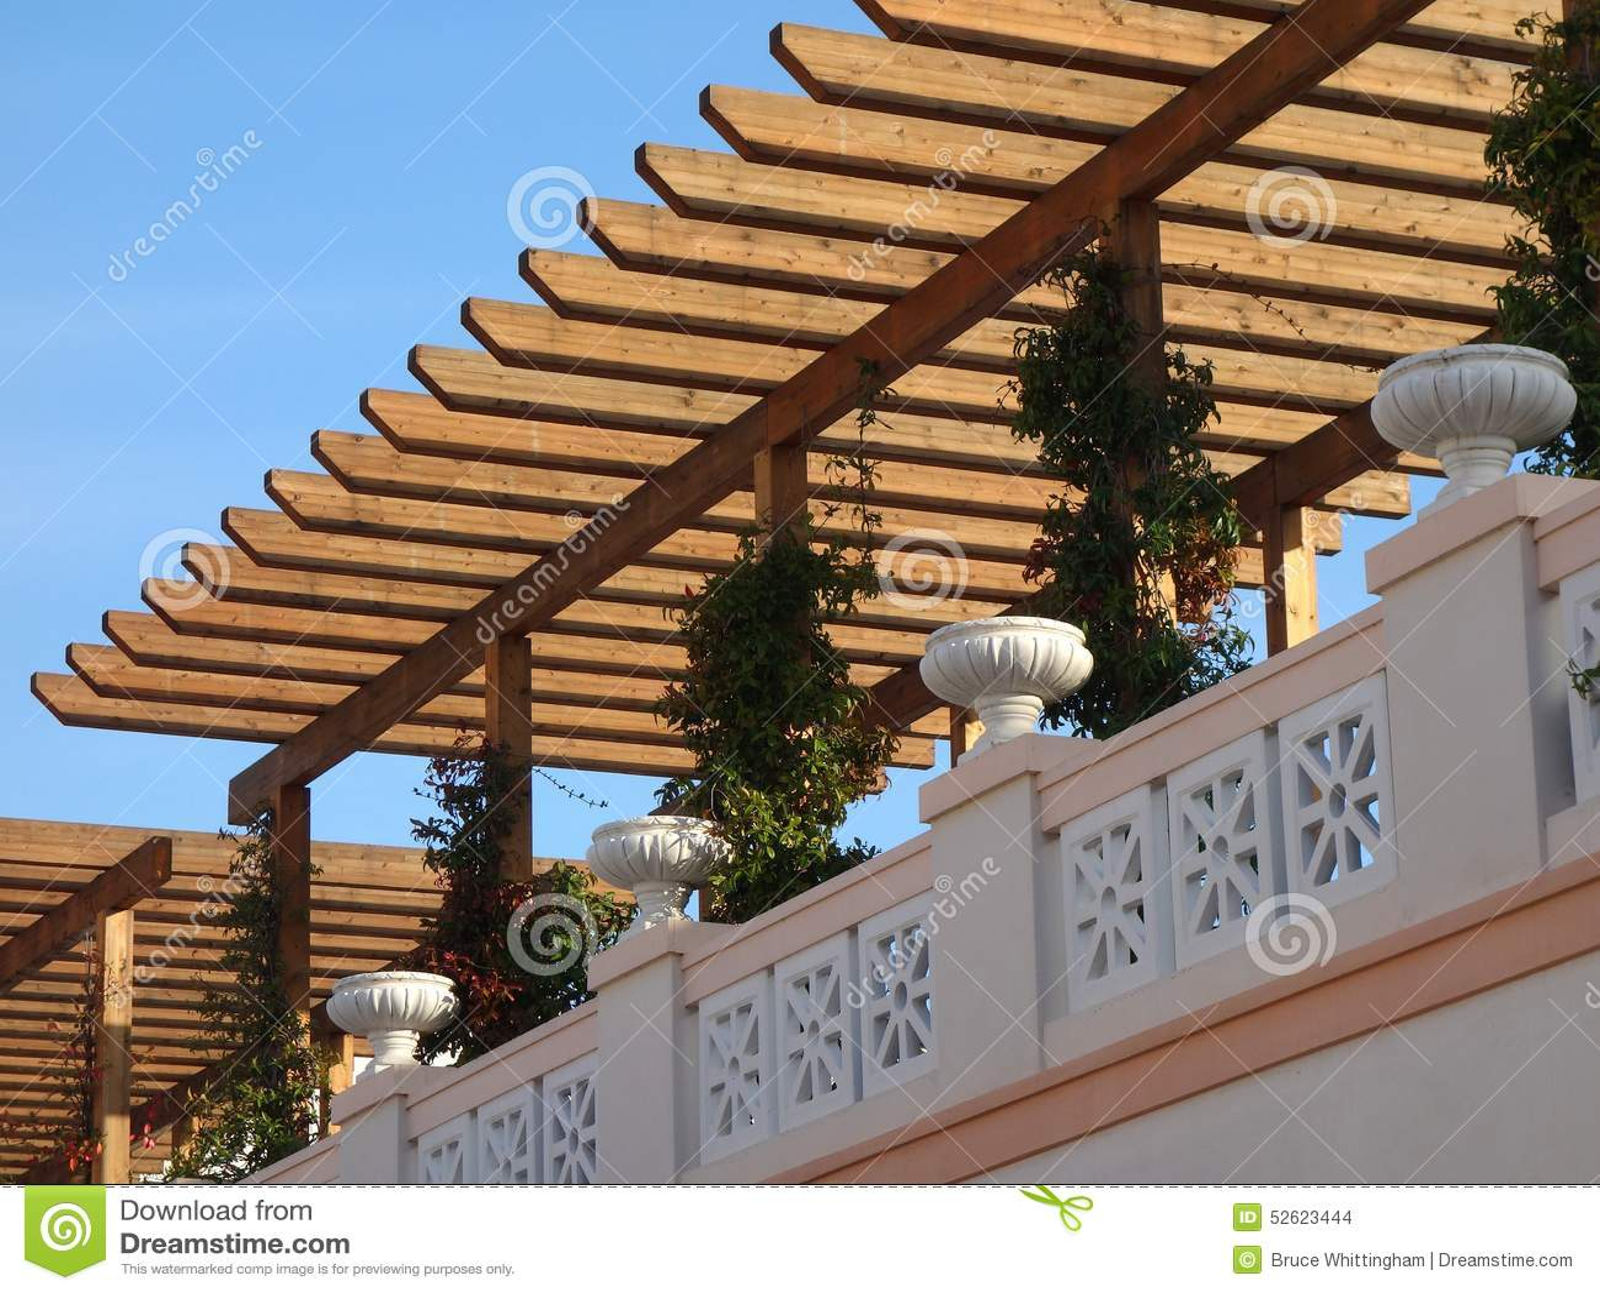 Wooden pergola stock photo image 52623444 for Terrace pergola